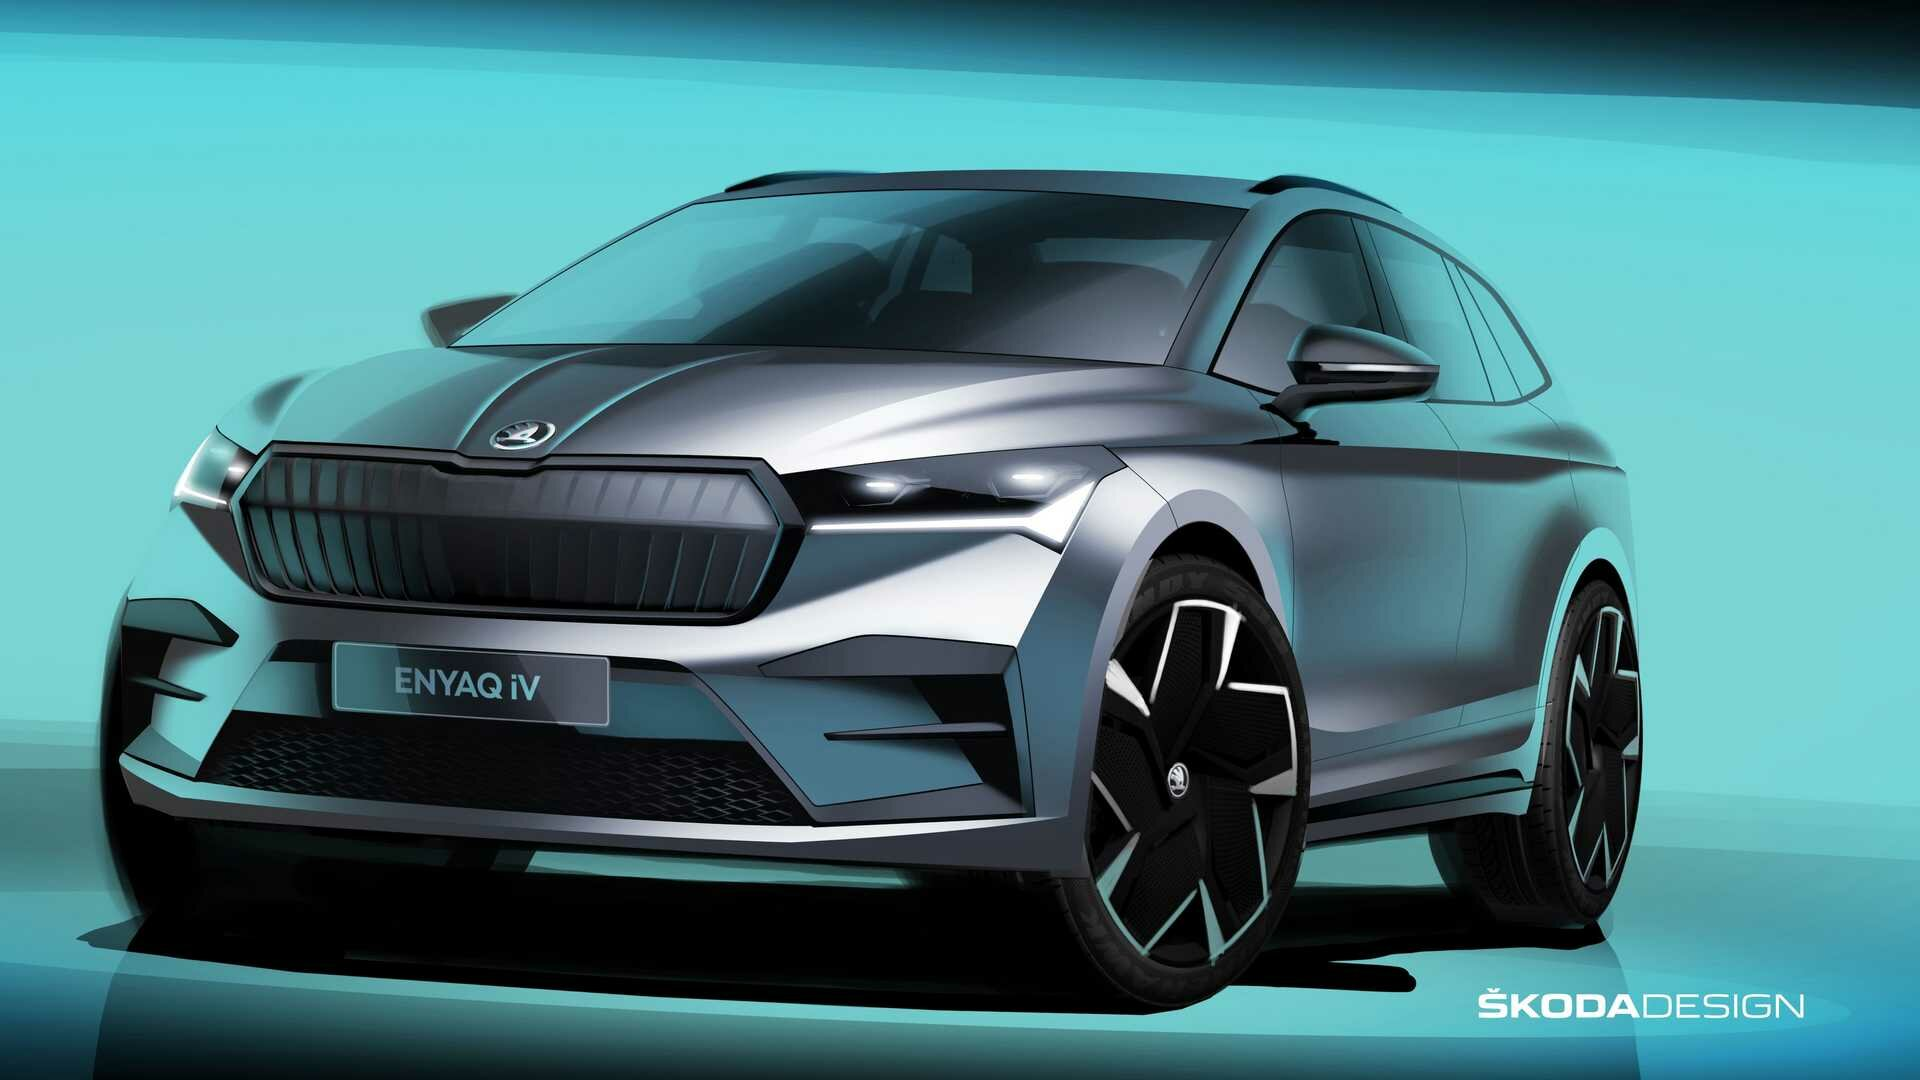 2021-skoda-enyaq-iv-exterior-design-teas